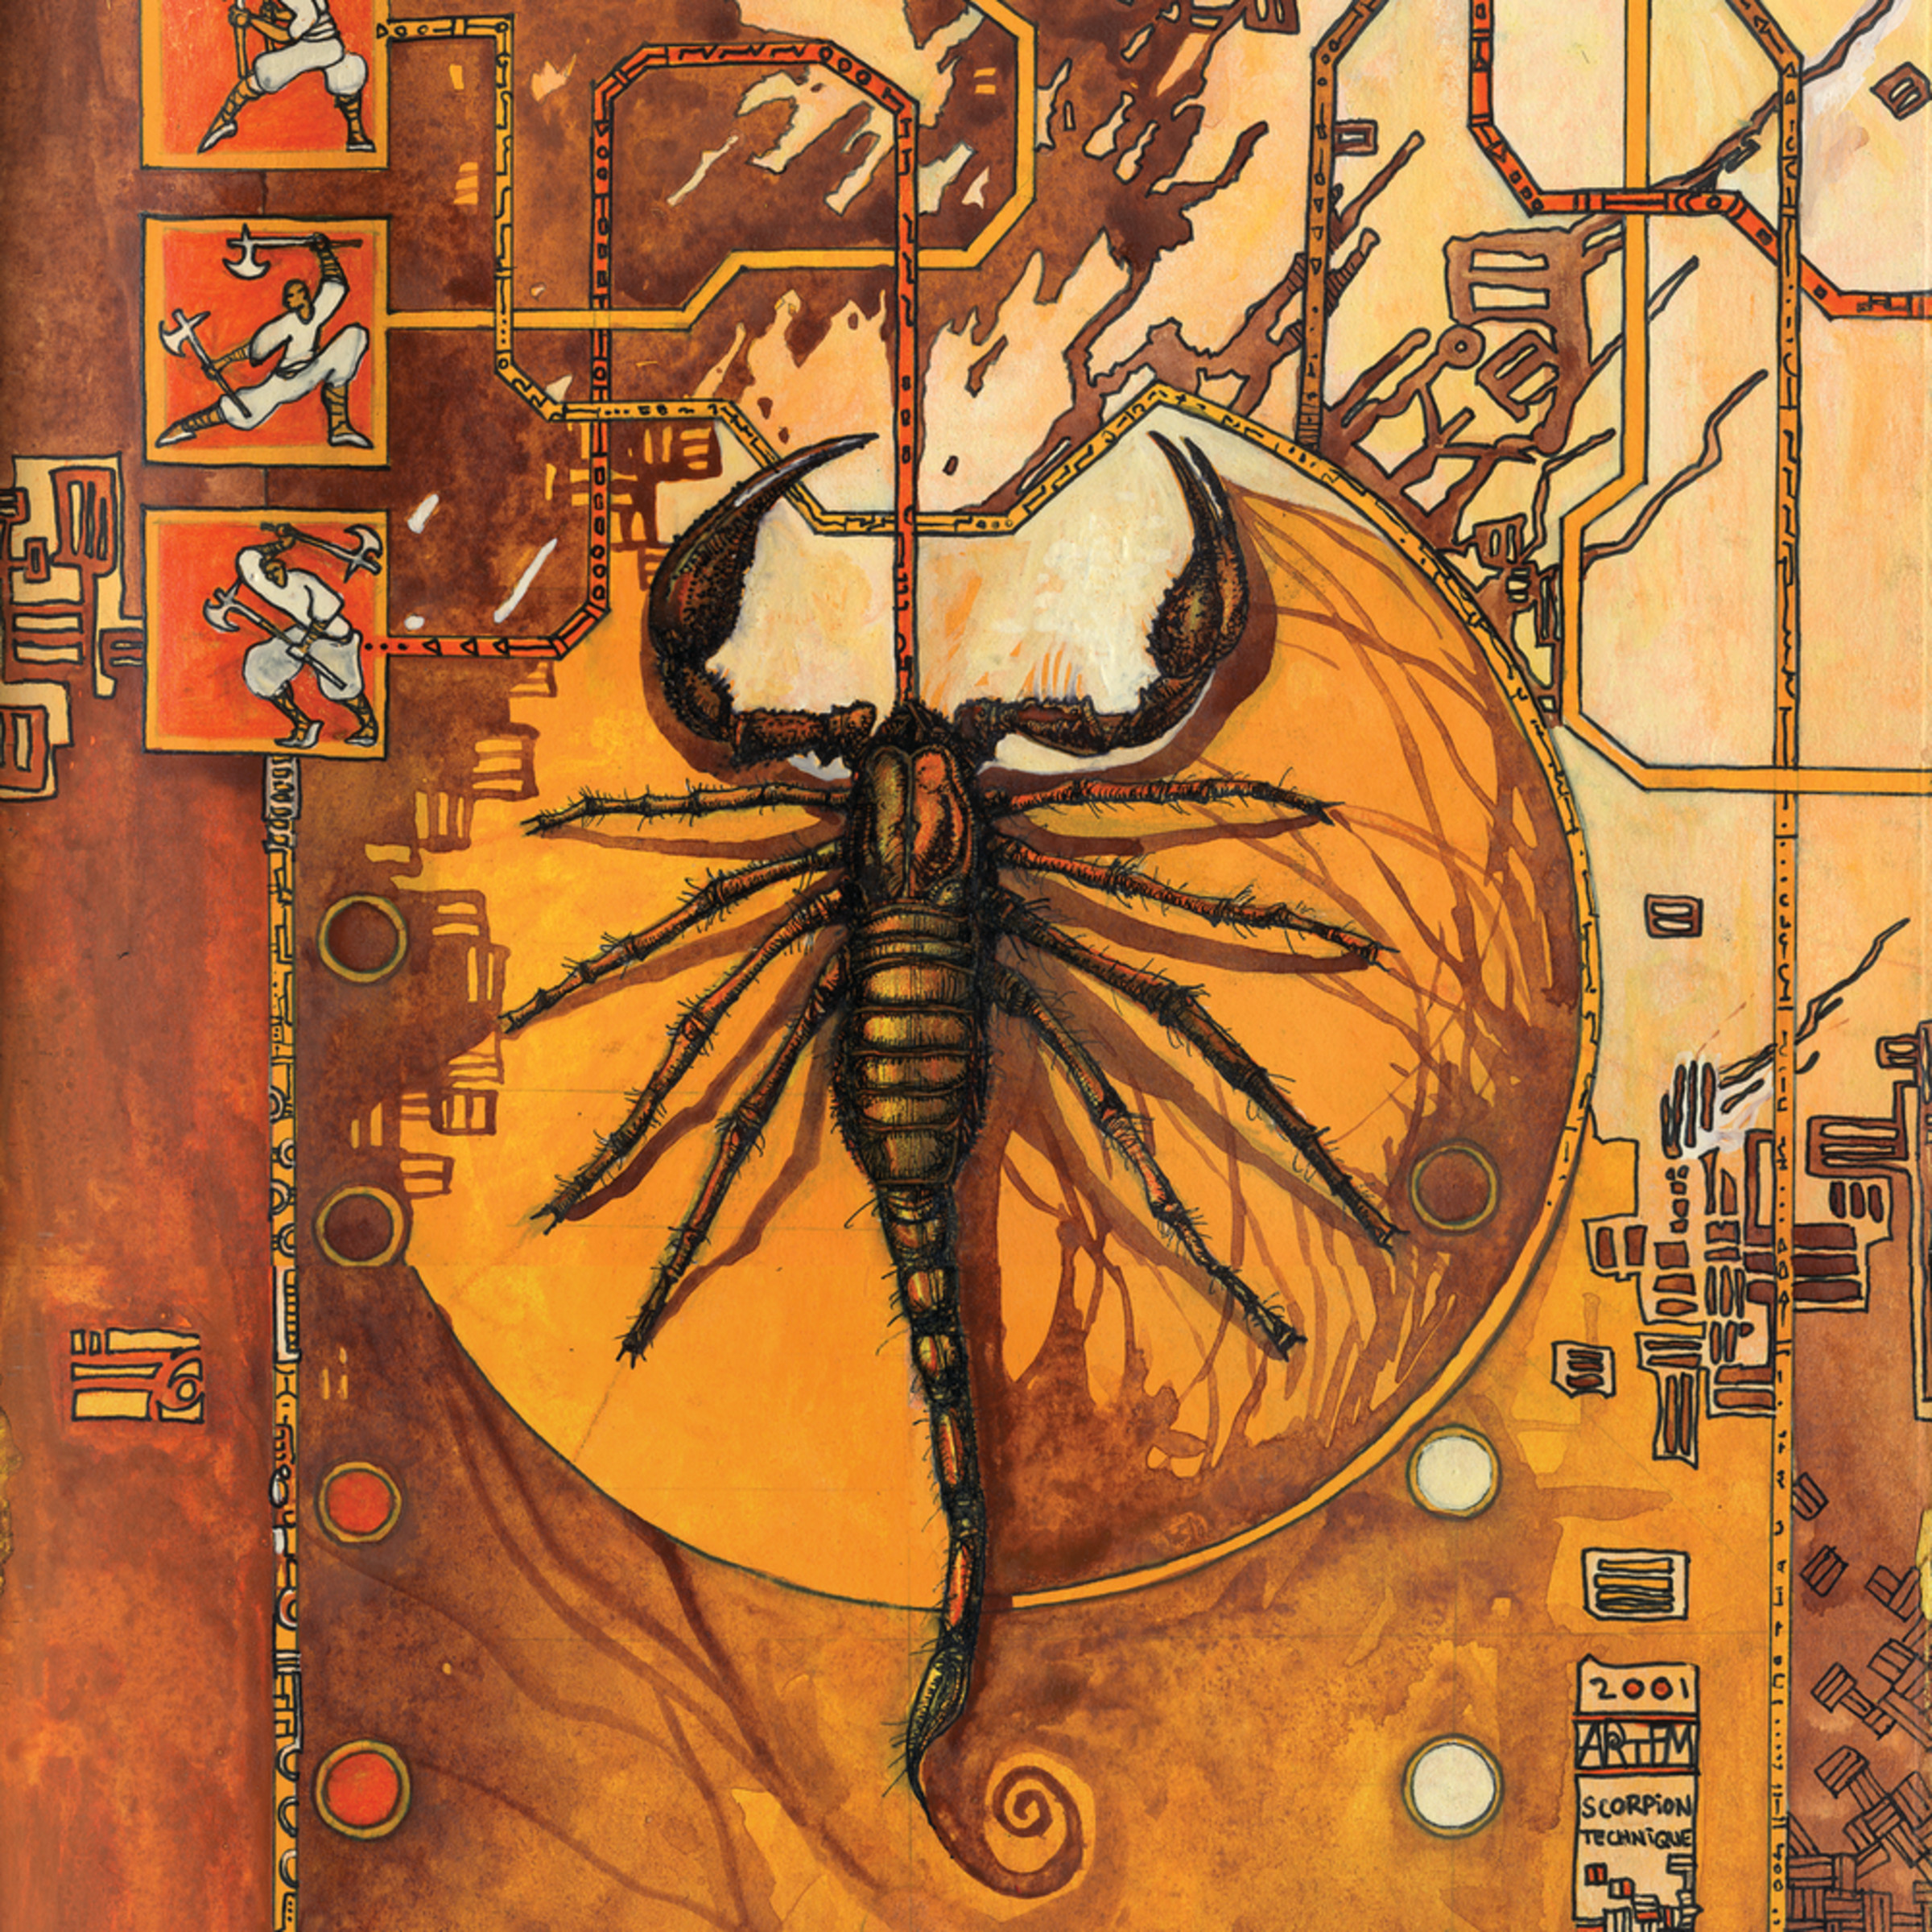 Scorpion cmyk ykjupb